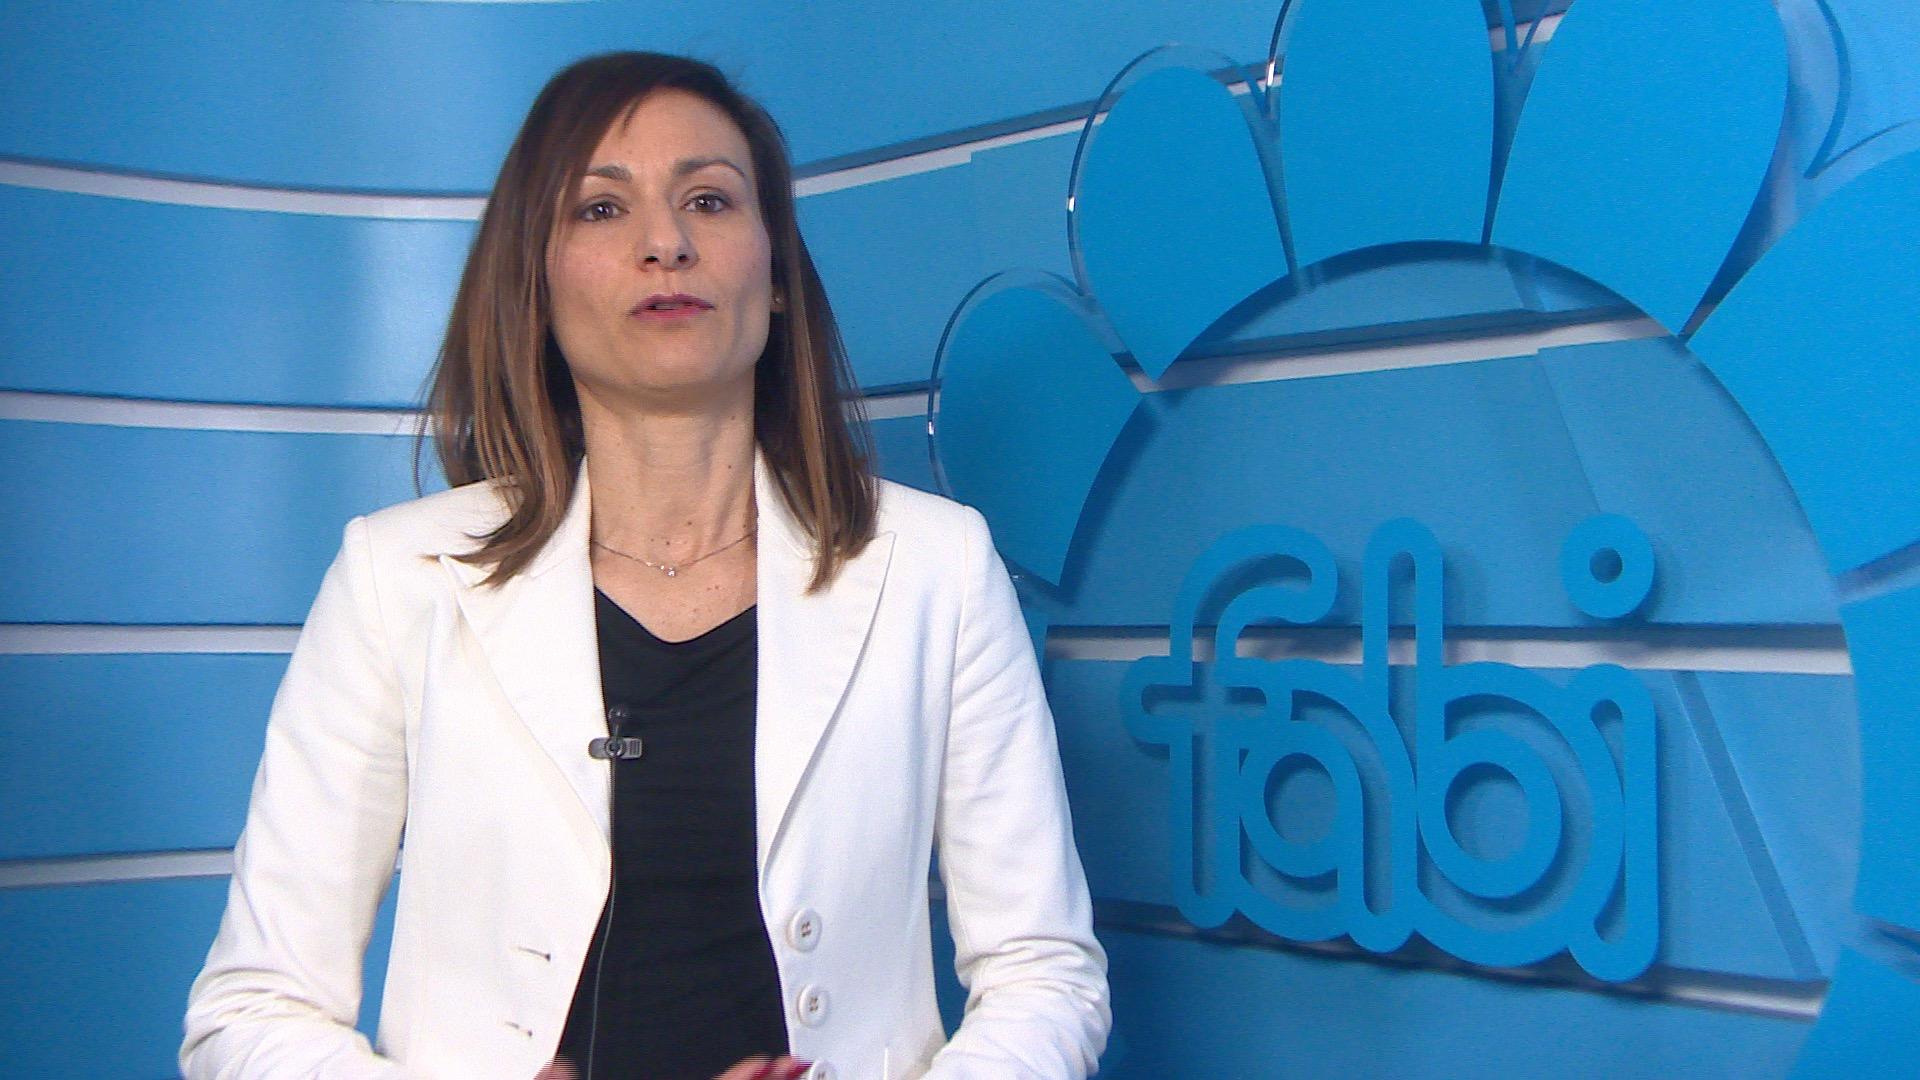 L'A...BCC - FOCUS CCB: I motivi del mancato accordo in Bcc Valdostana